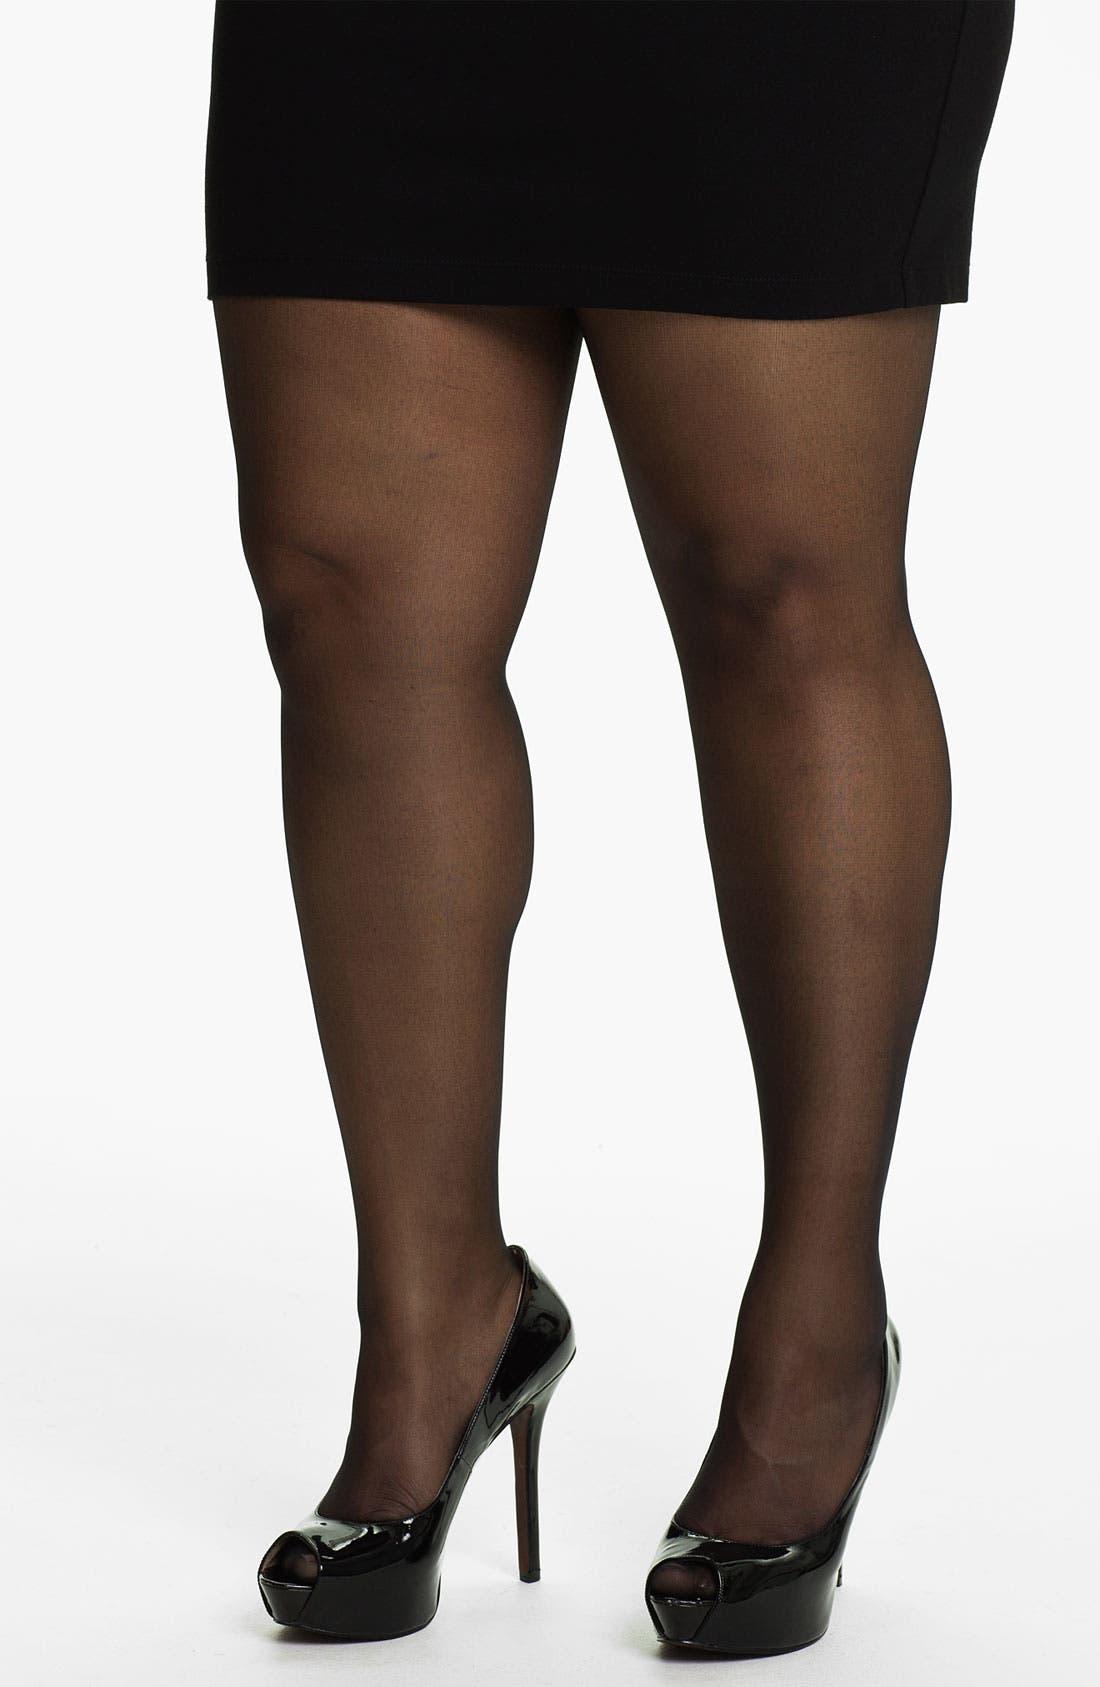 Main Image - Pretty Polly 'Curves' 10 Denier Tights (Plus Size)